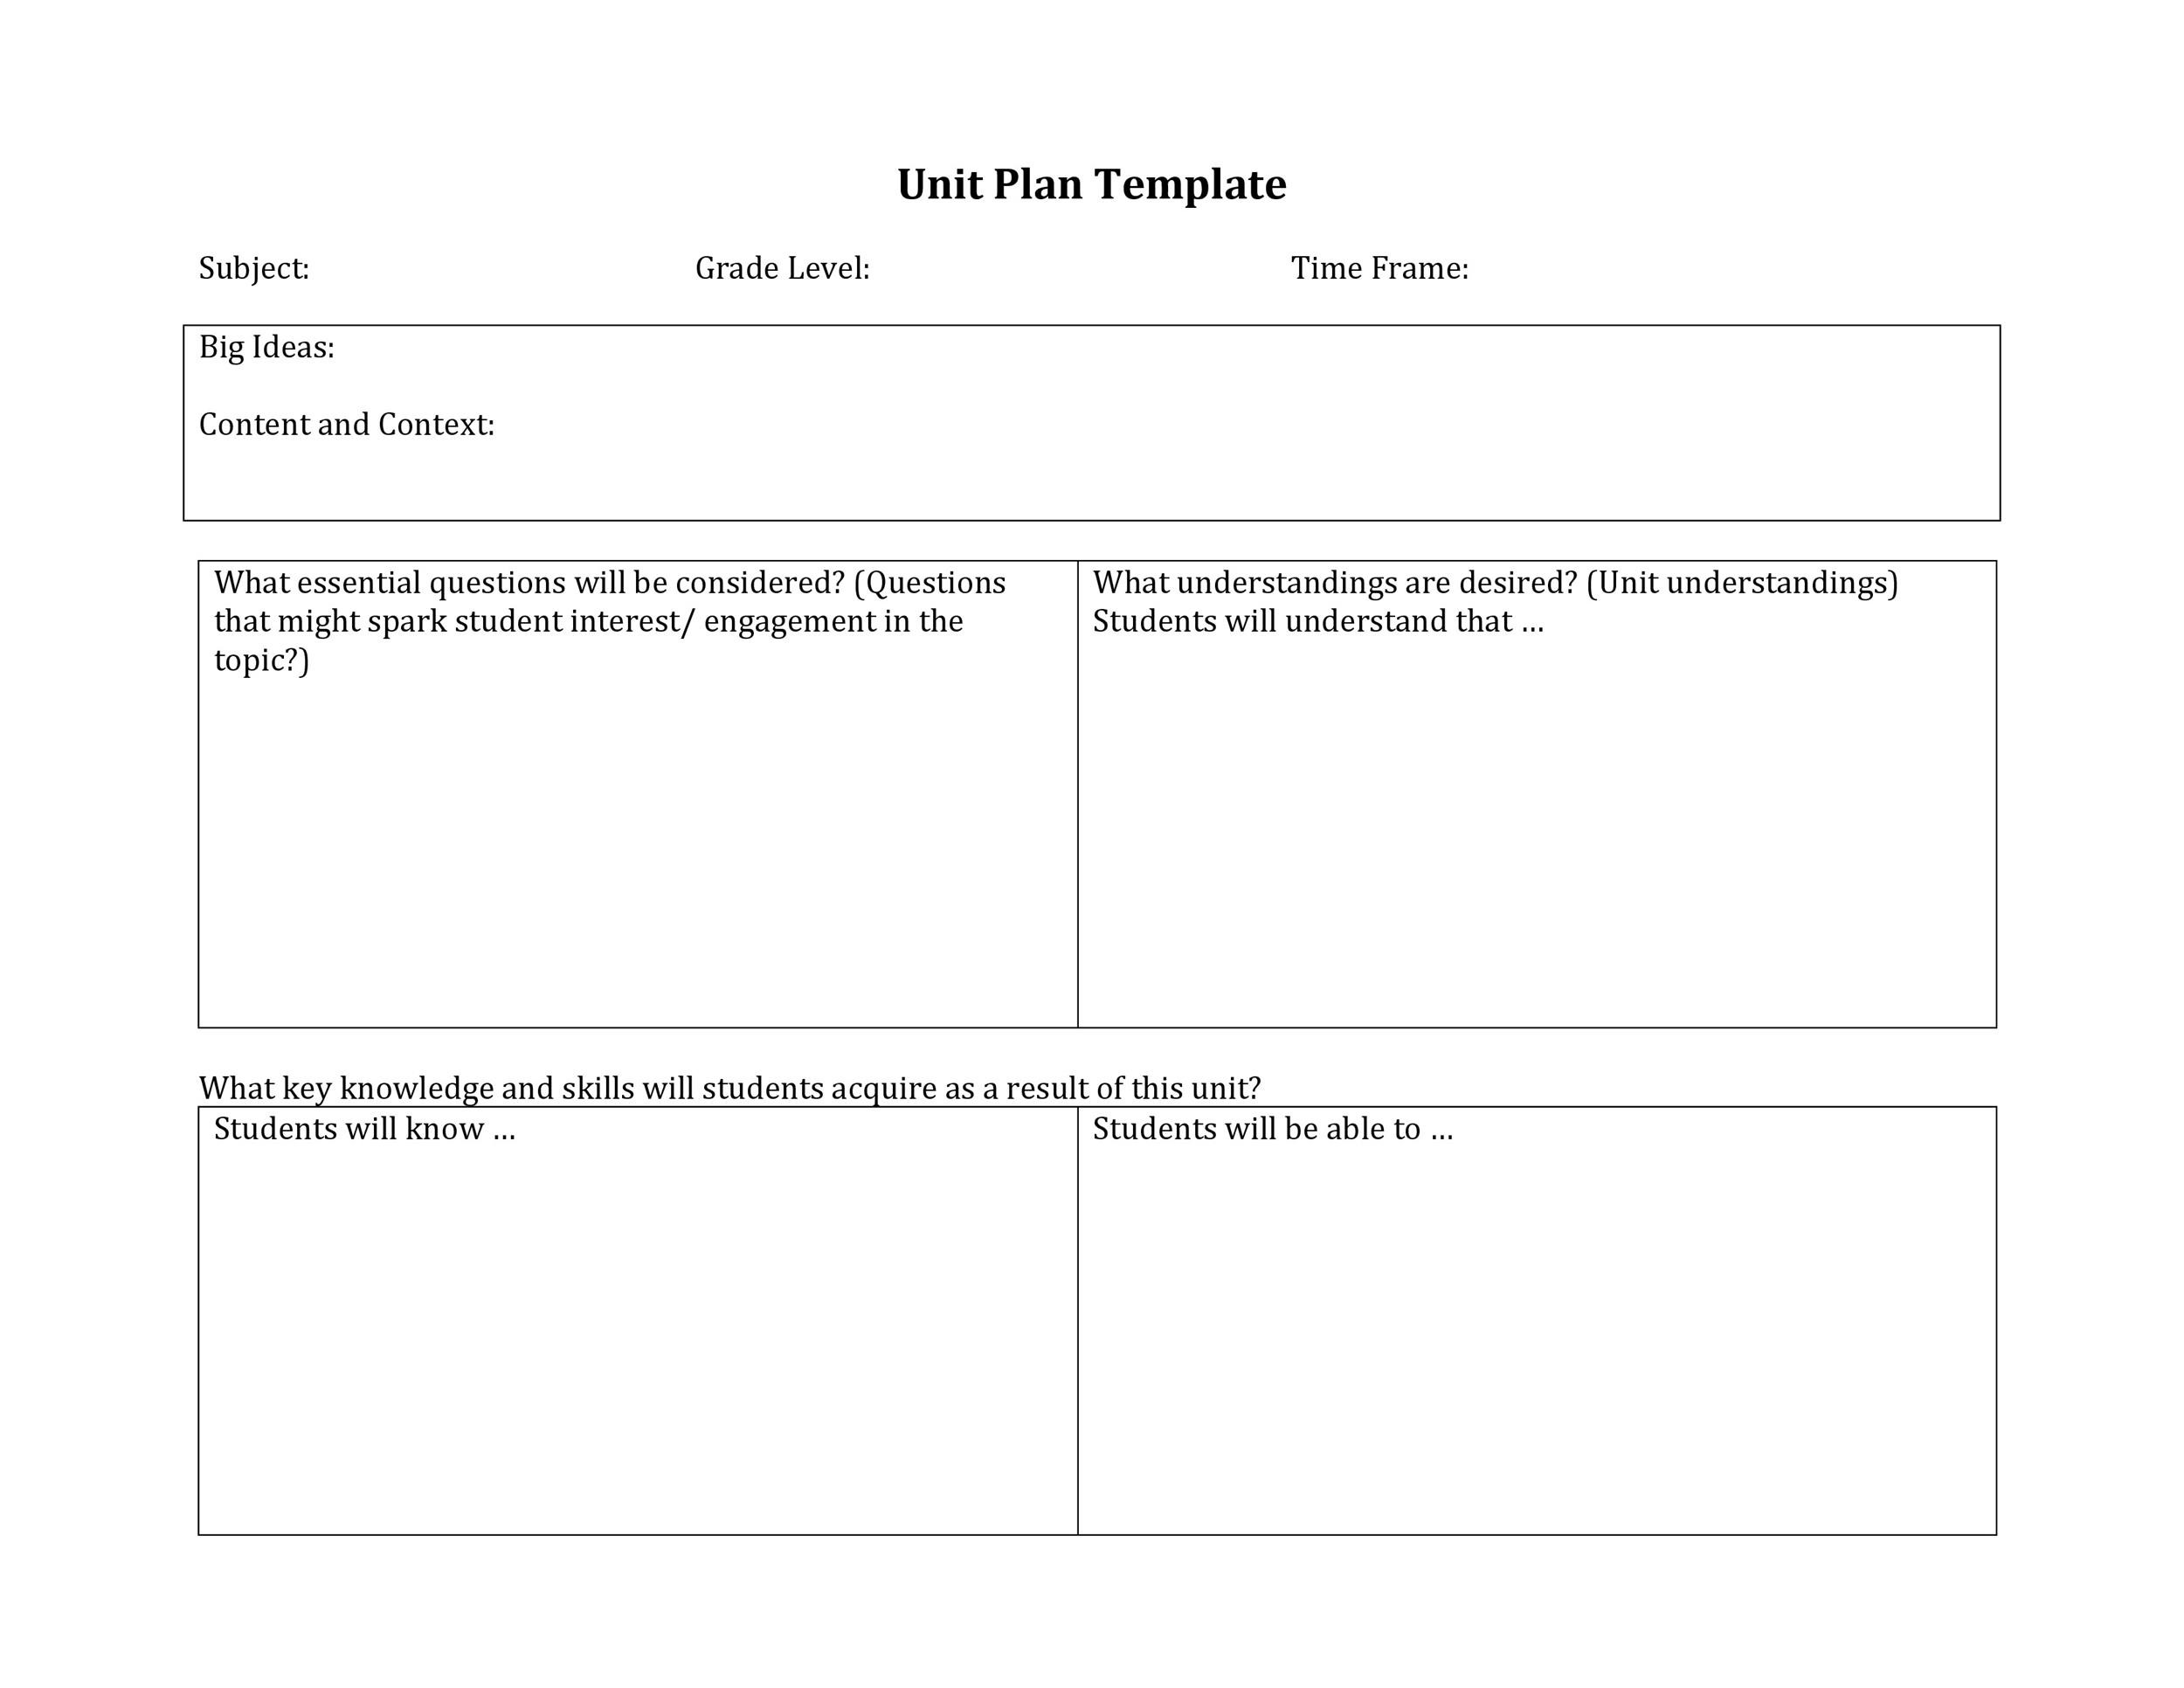 Free unit plan template 15